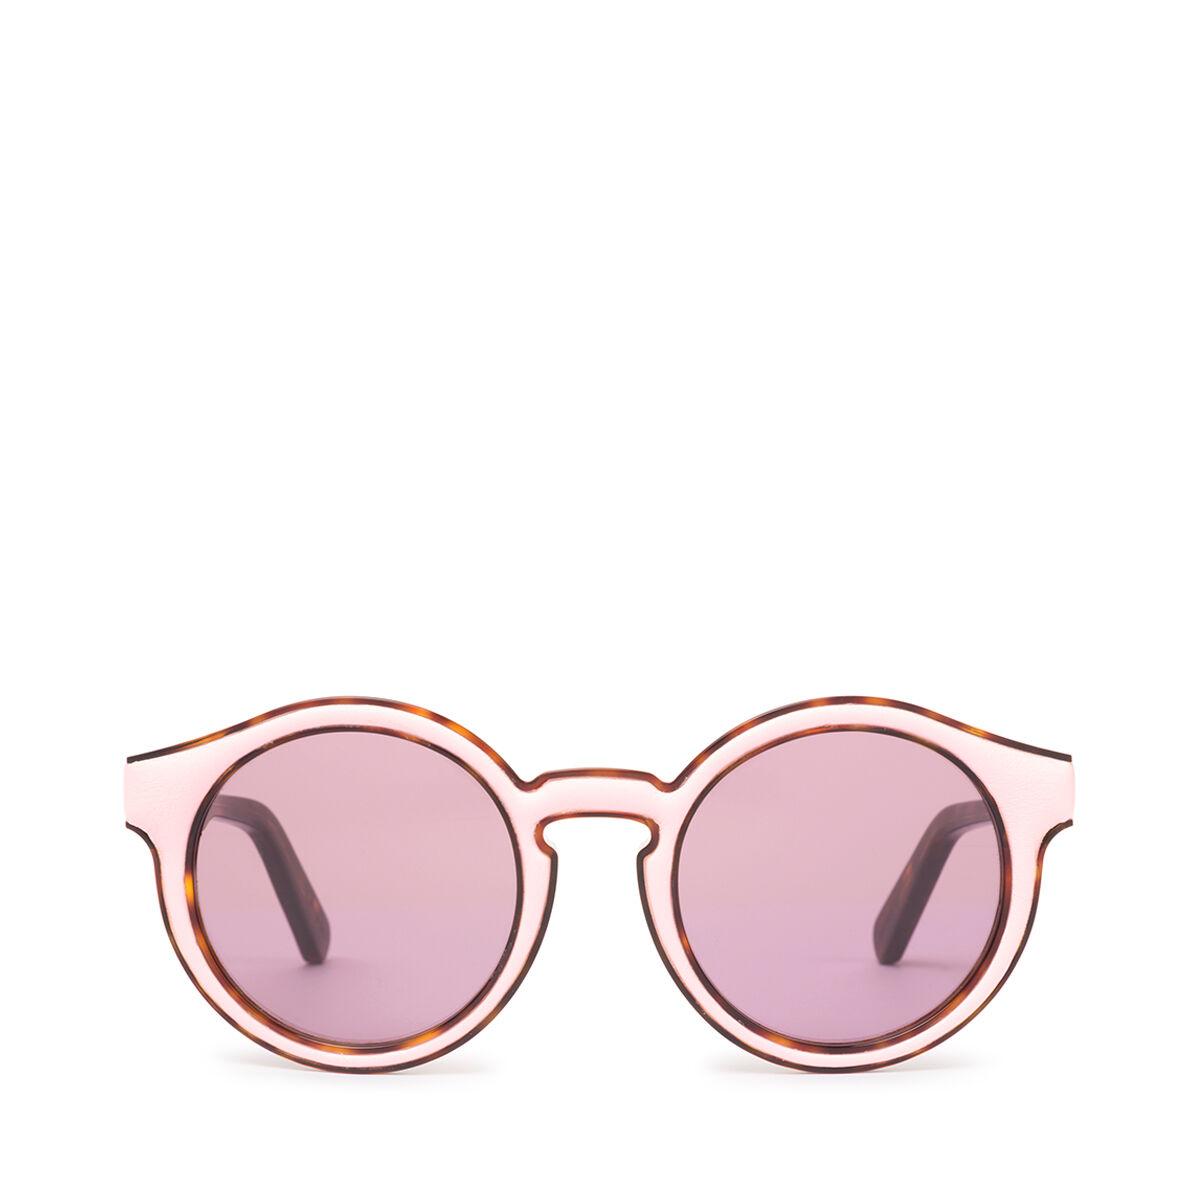 LOEWE Gafas Redondas Acolchadas Rosa/Rosa front